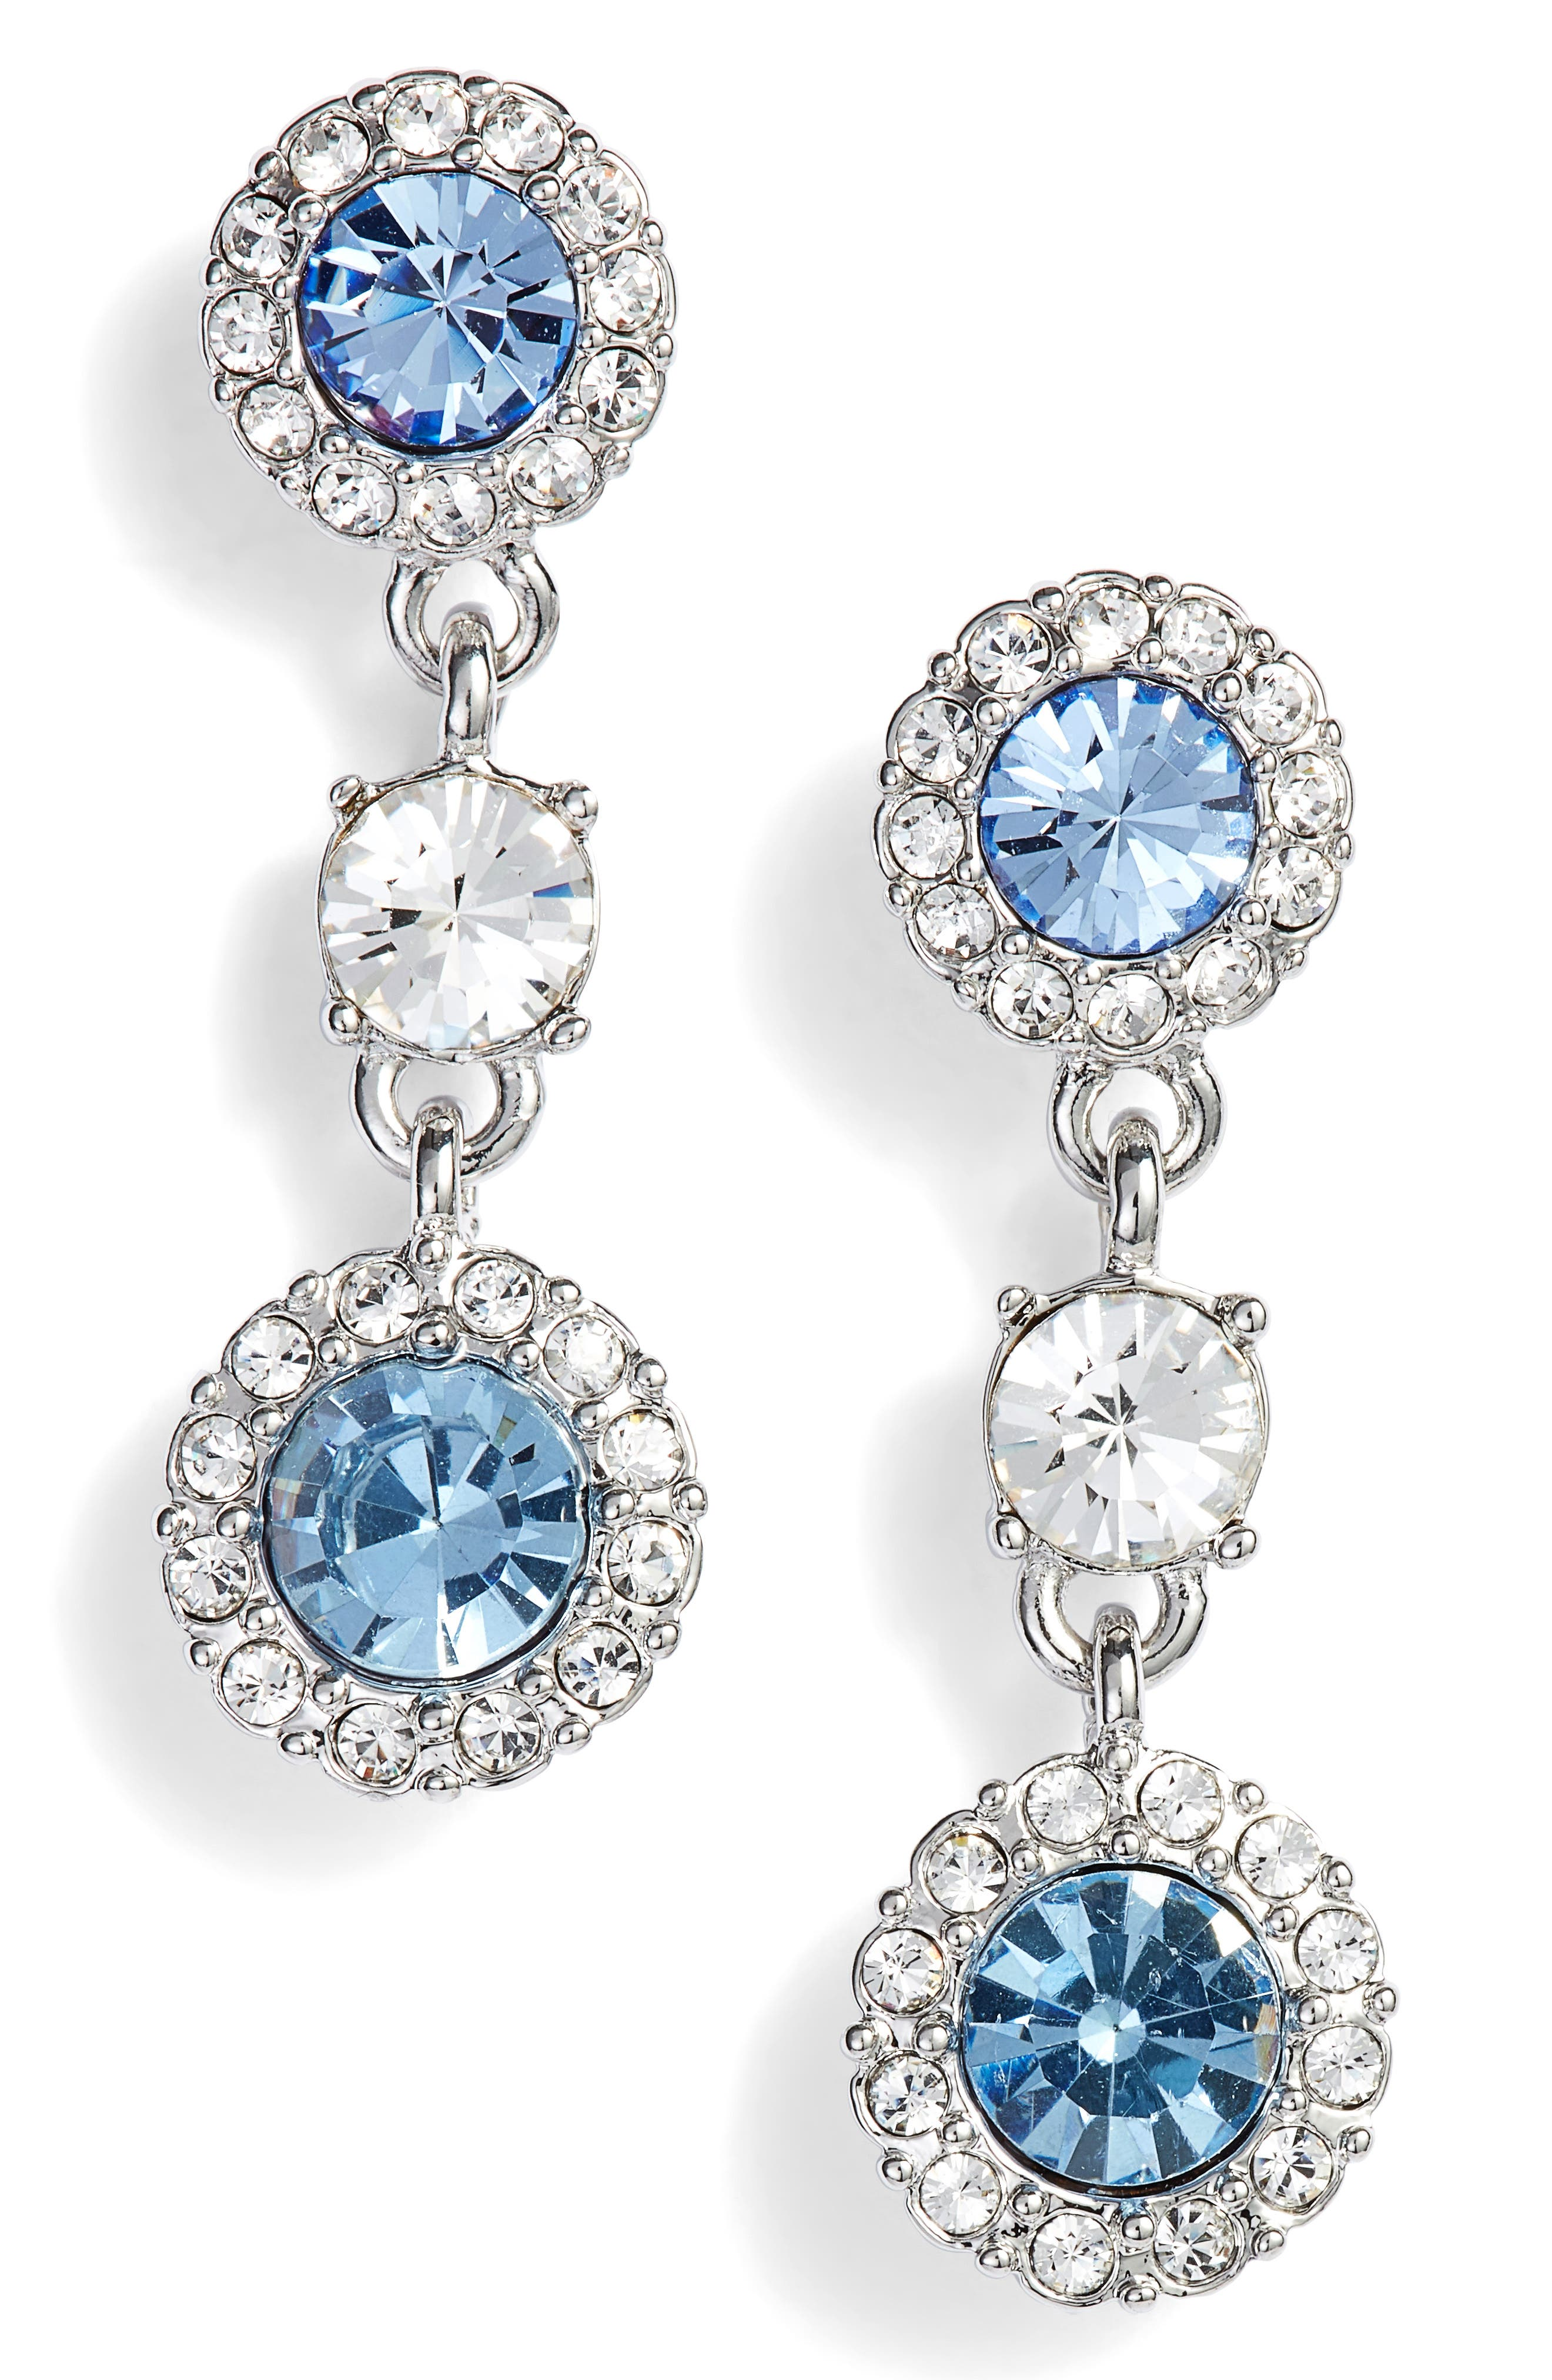 Swarovski Crystal Triple Drop Earrings,                             Main thumbnail 1, color,                             SILVER/ SAPPHIRE/ CRYSTAL